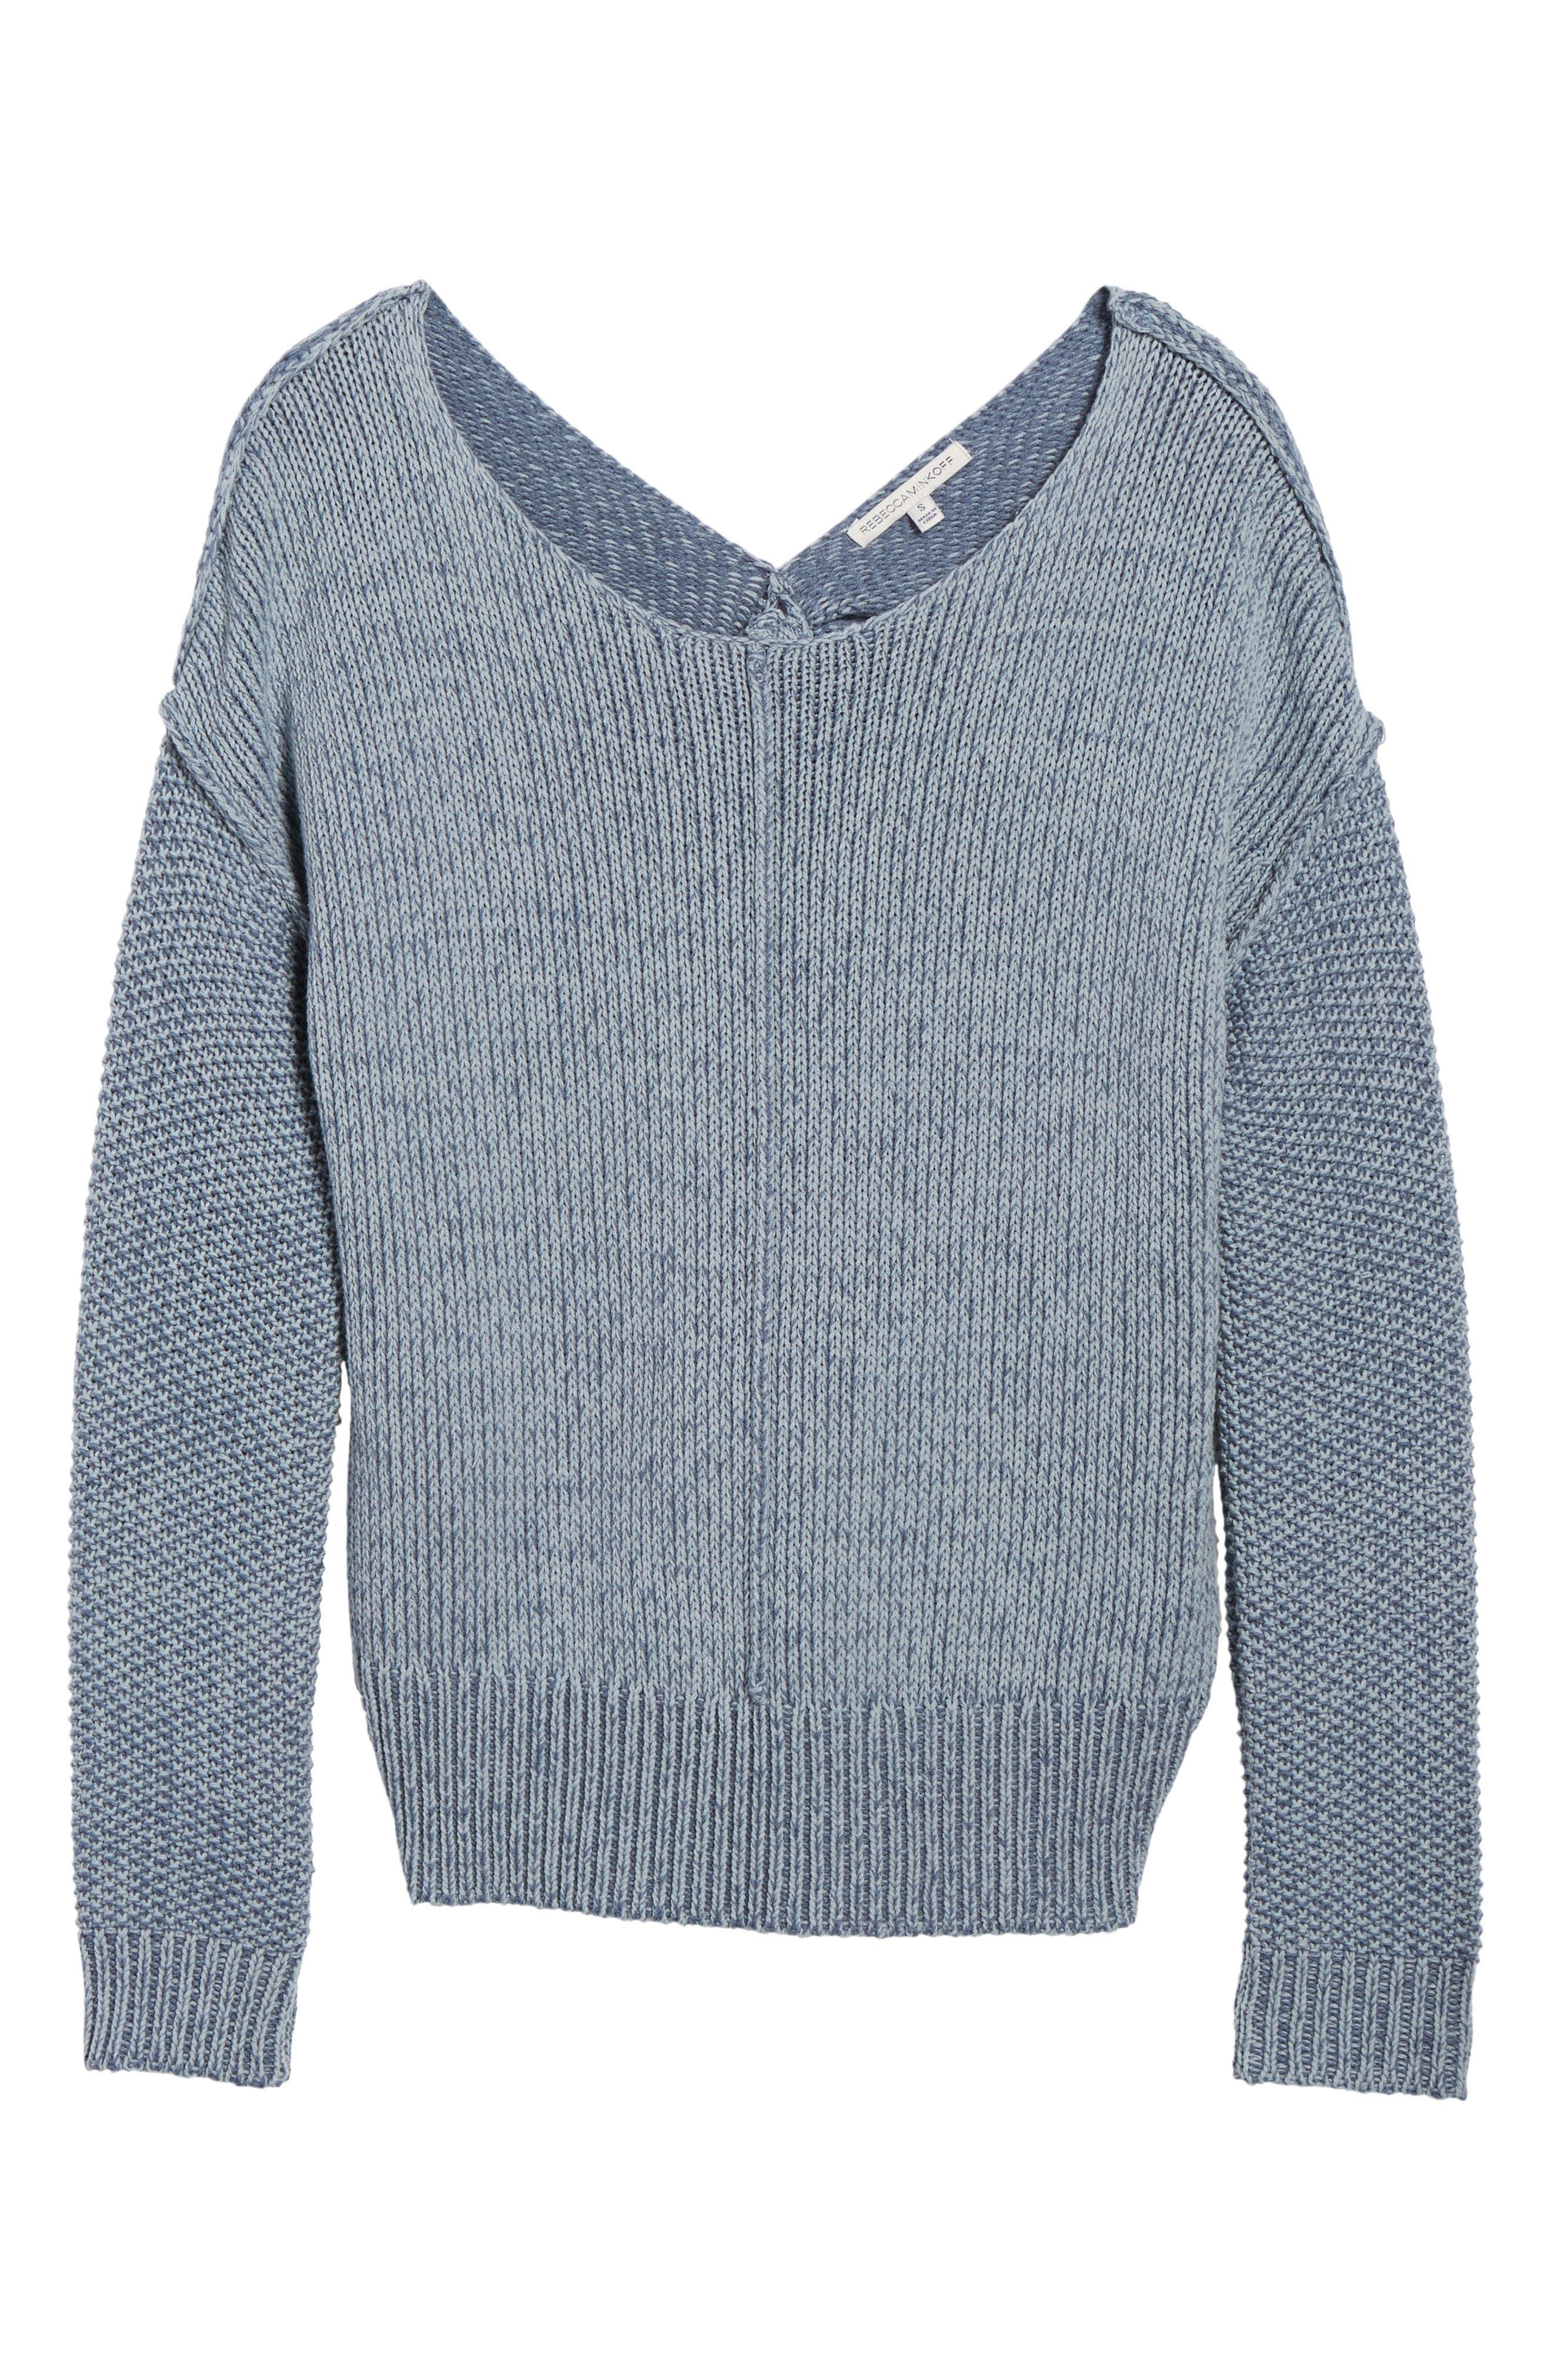 Lola Reversible Twist Sweater,                             Alternate thumbnail 6, color,                             Light Blue